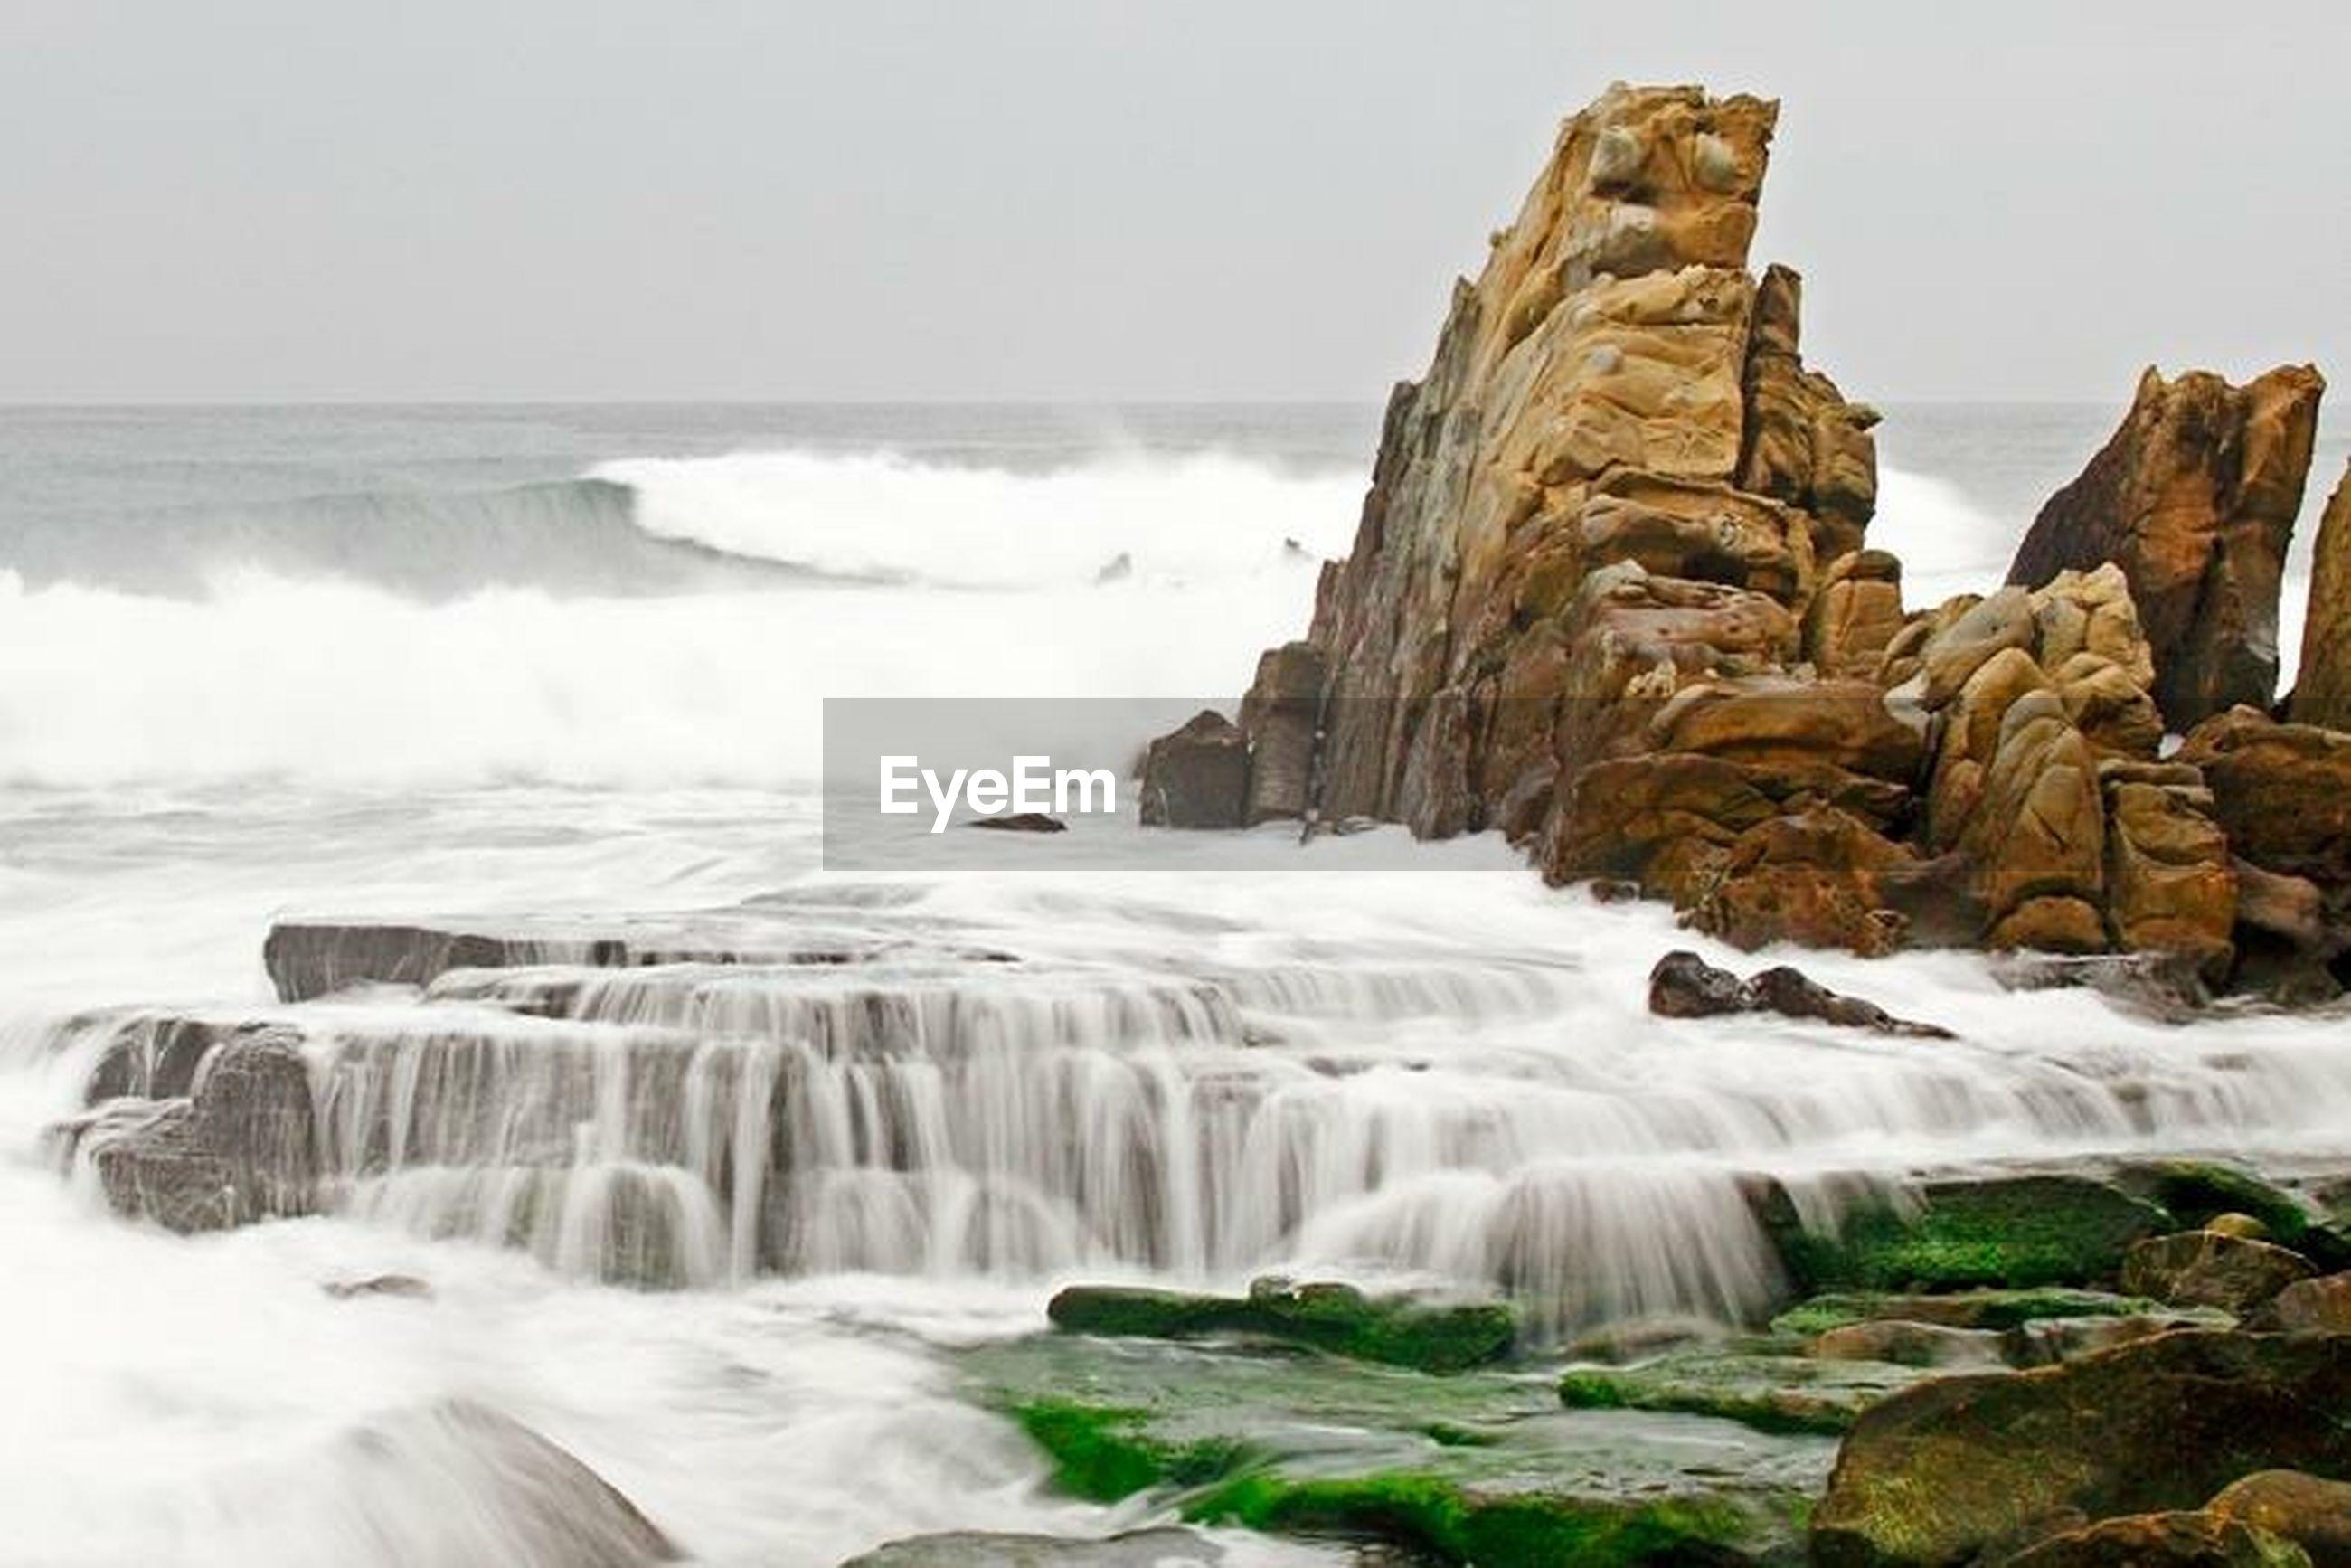 water, motion, surf, sea, splashing, rock - object, wave, scenics, beauty in nature, long exposure, power in nature, rock formation, waterfall, nature, flowing water, horizon over water, rock, idyllic, flowing, sky